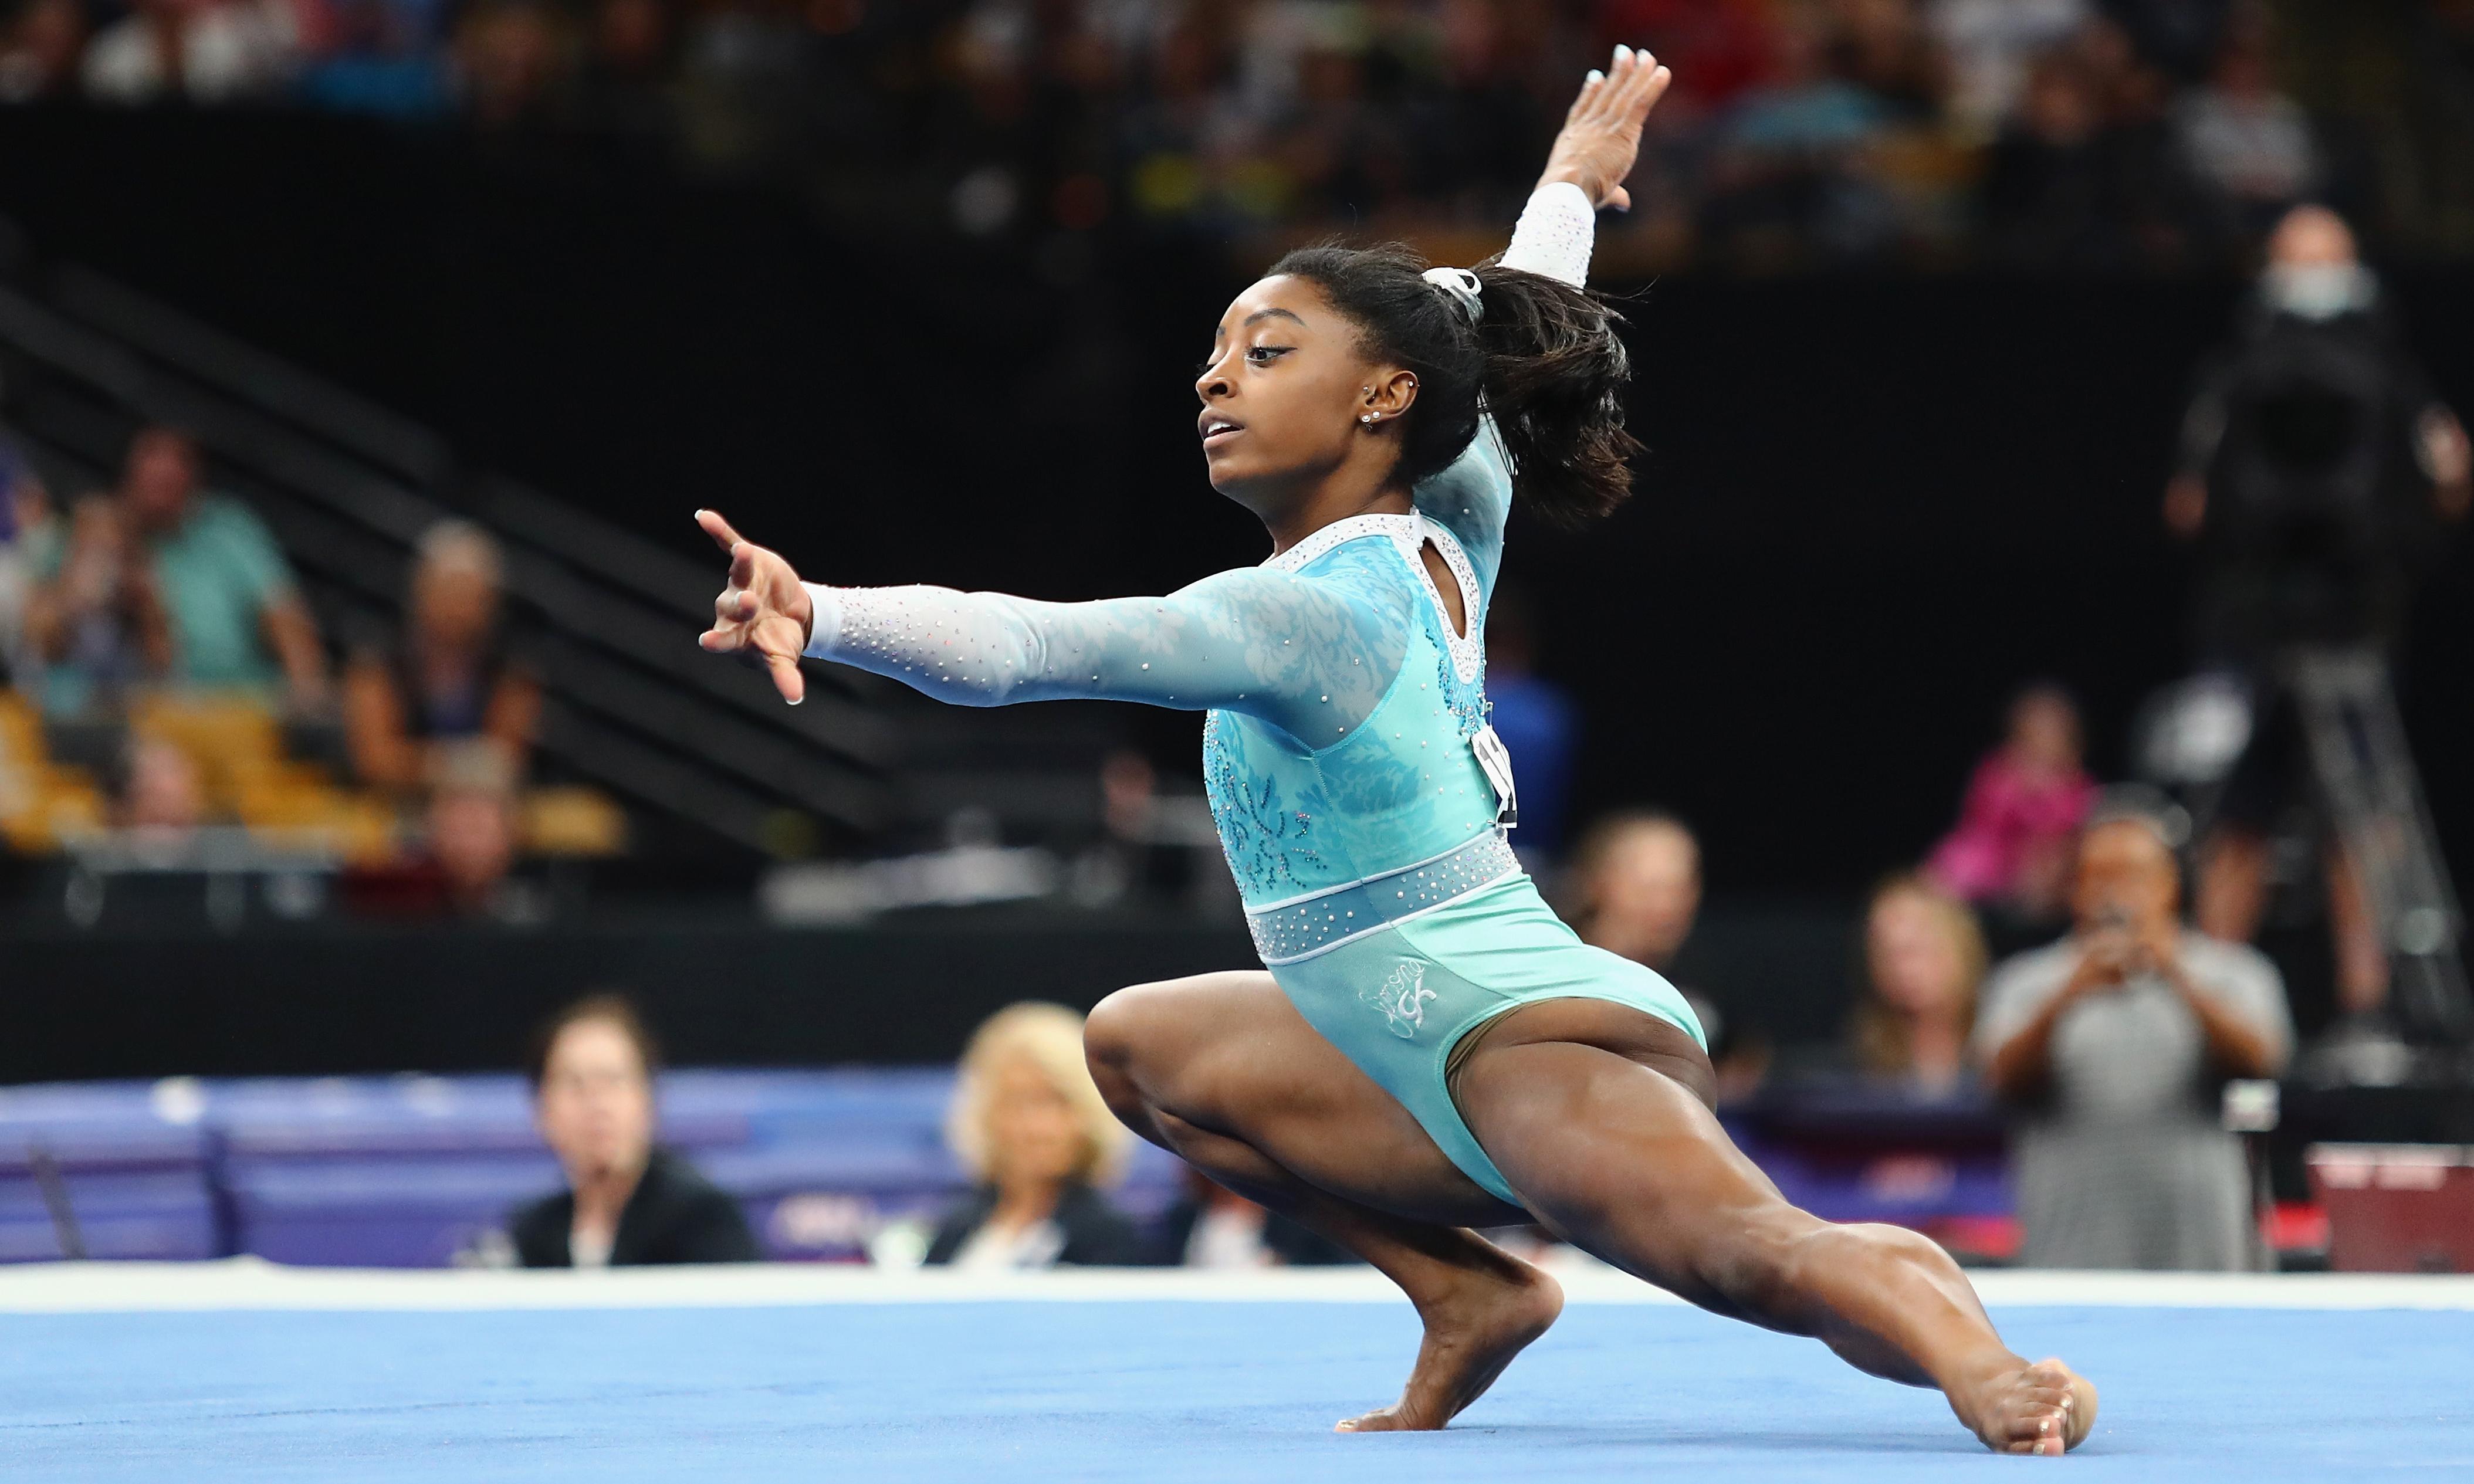 A Gymnast With RA: Carolines Story